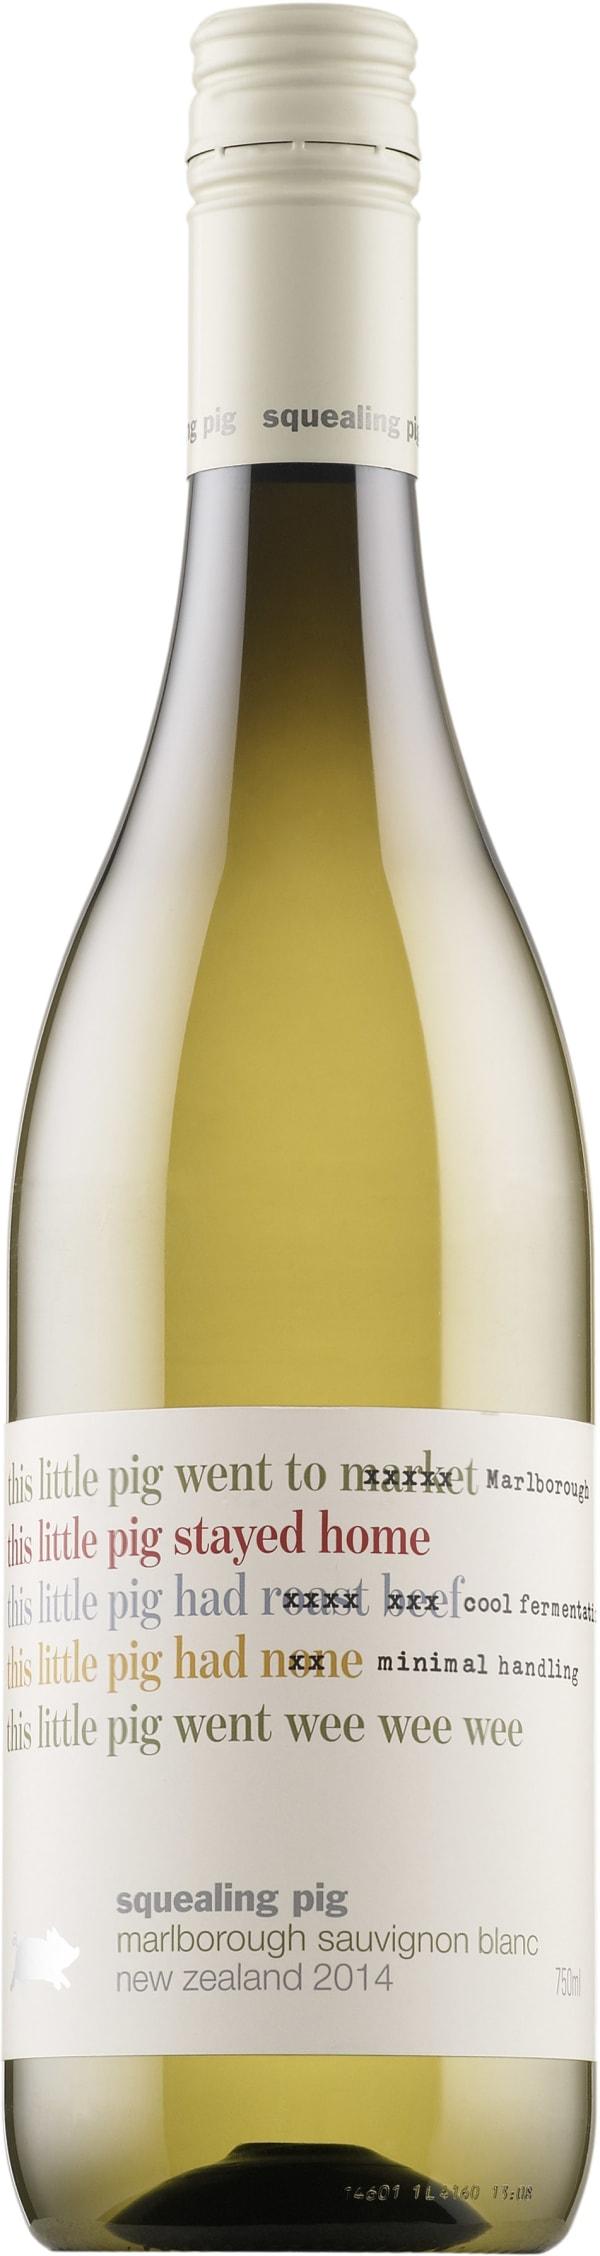 Squealing Pig Sauvignon Blanc 2016 plastflaska